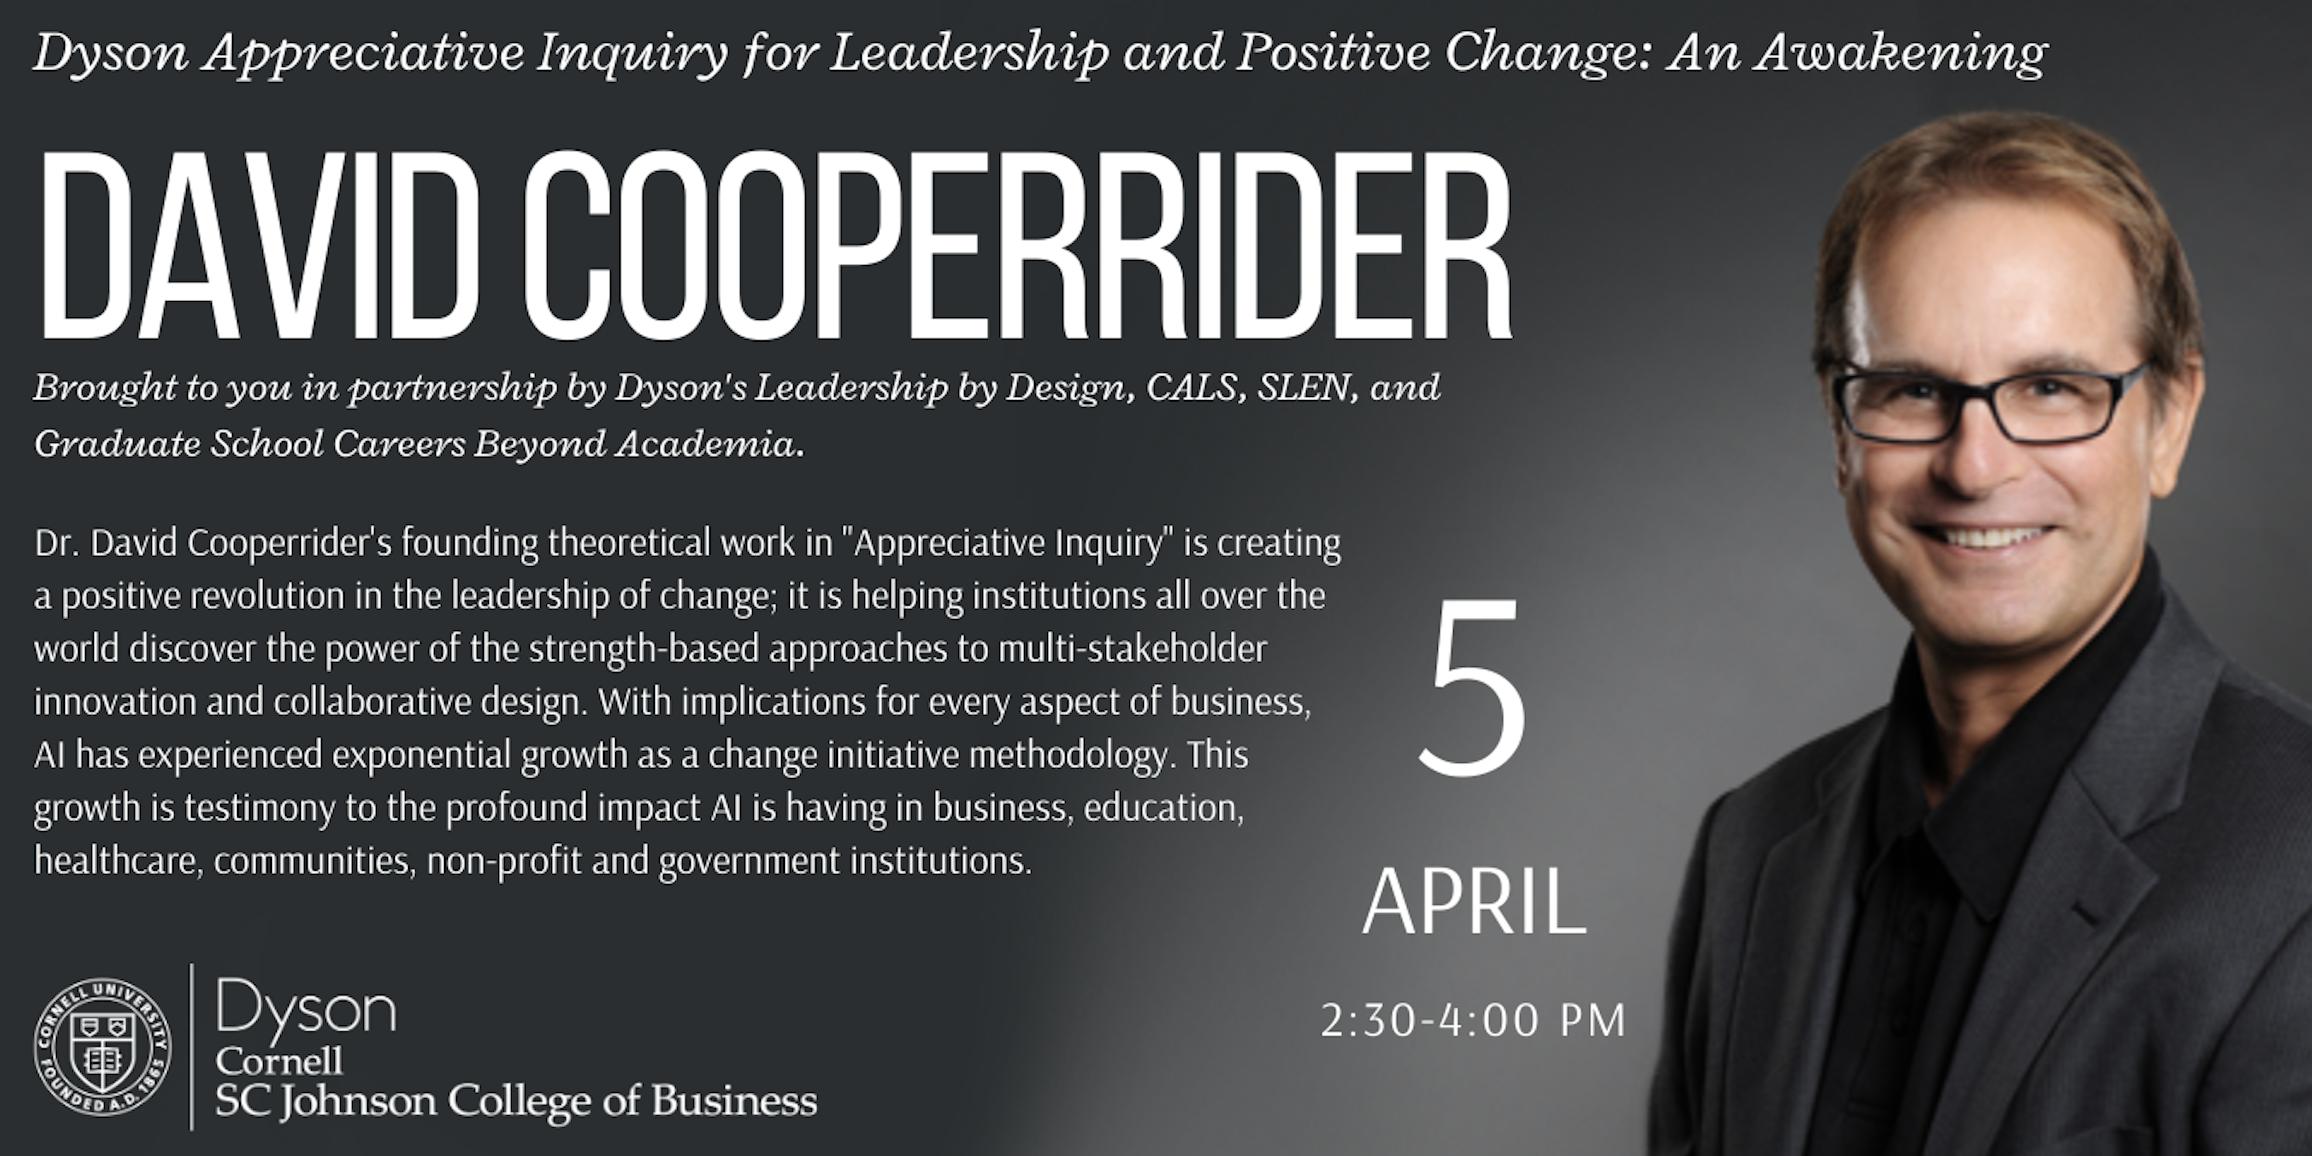 David Cooperrider Appreciative Inquiry workshop